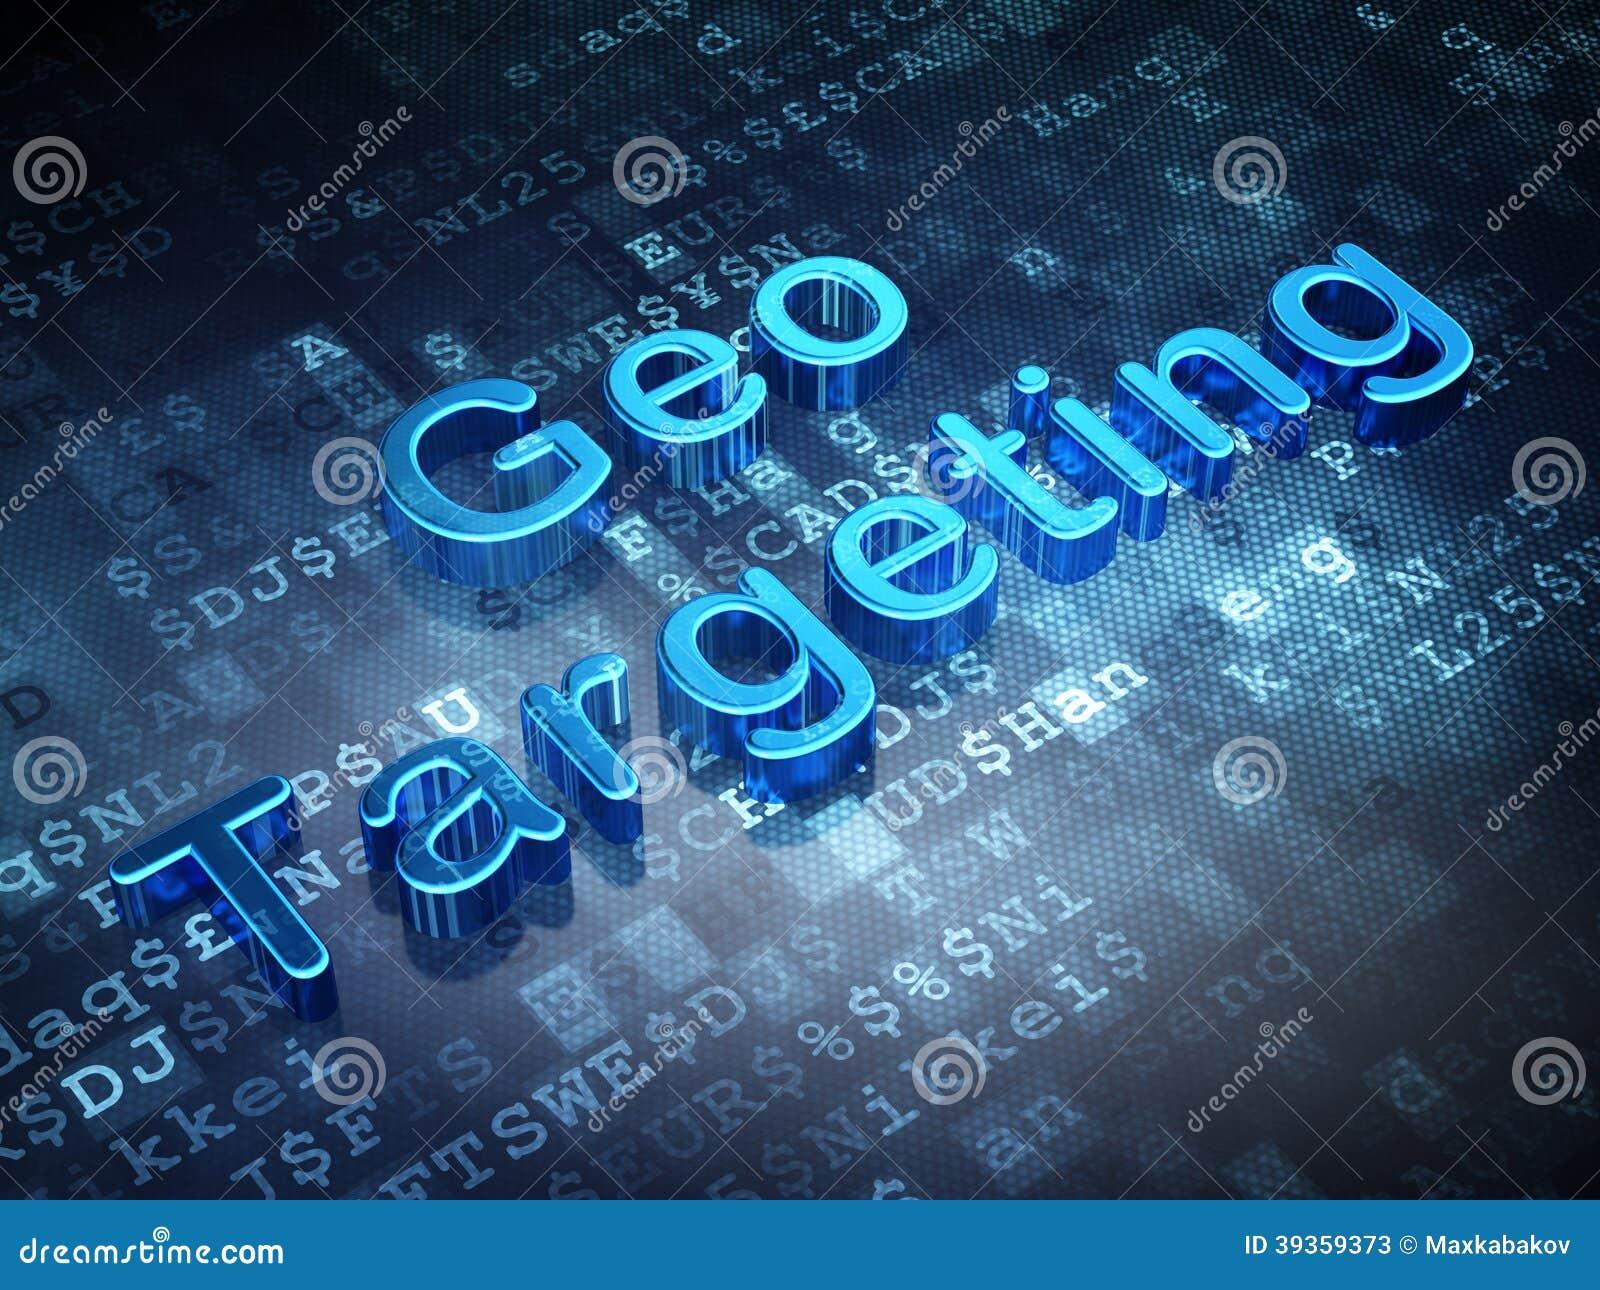 Bedrijfsconcept: Blauw Geo die op digitale achtergrond richten